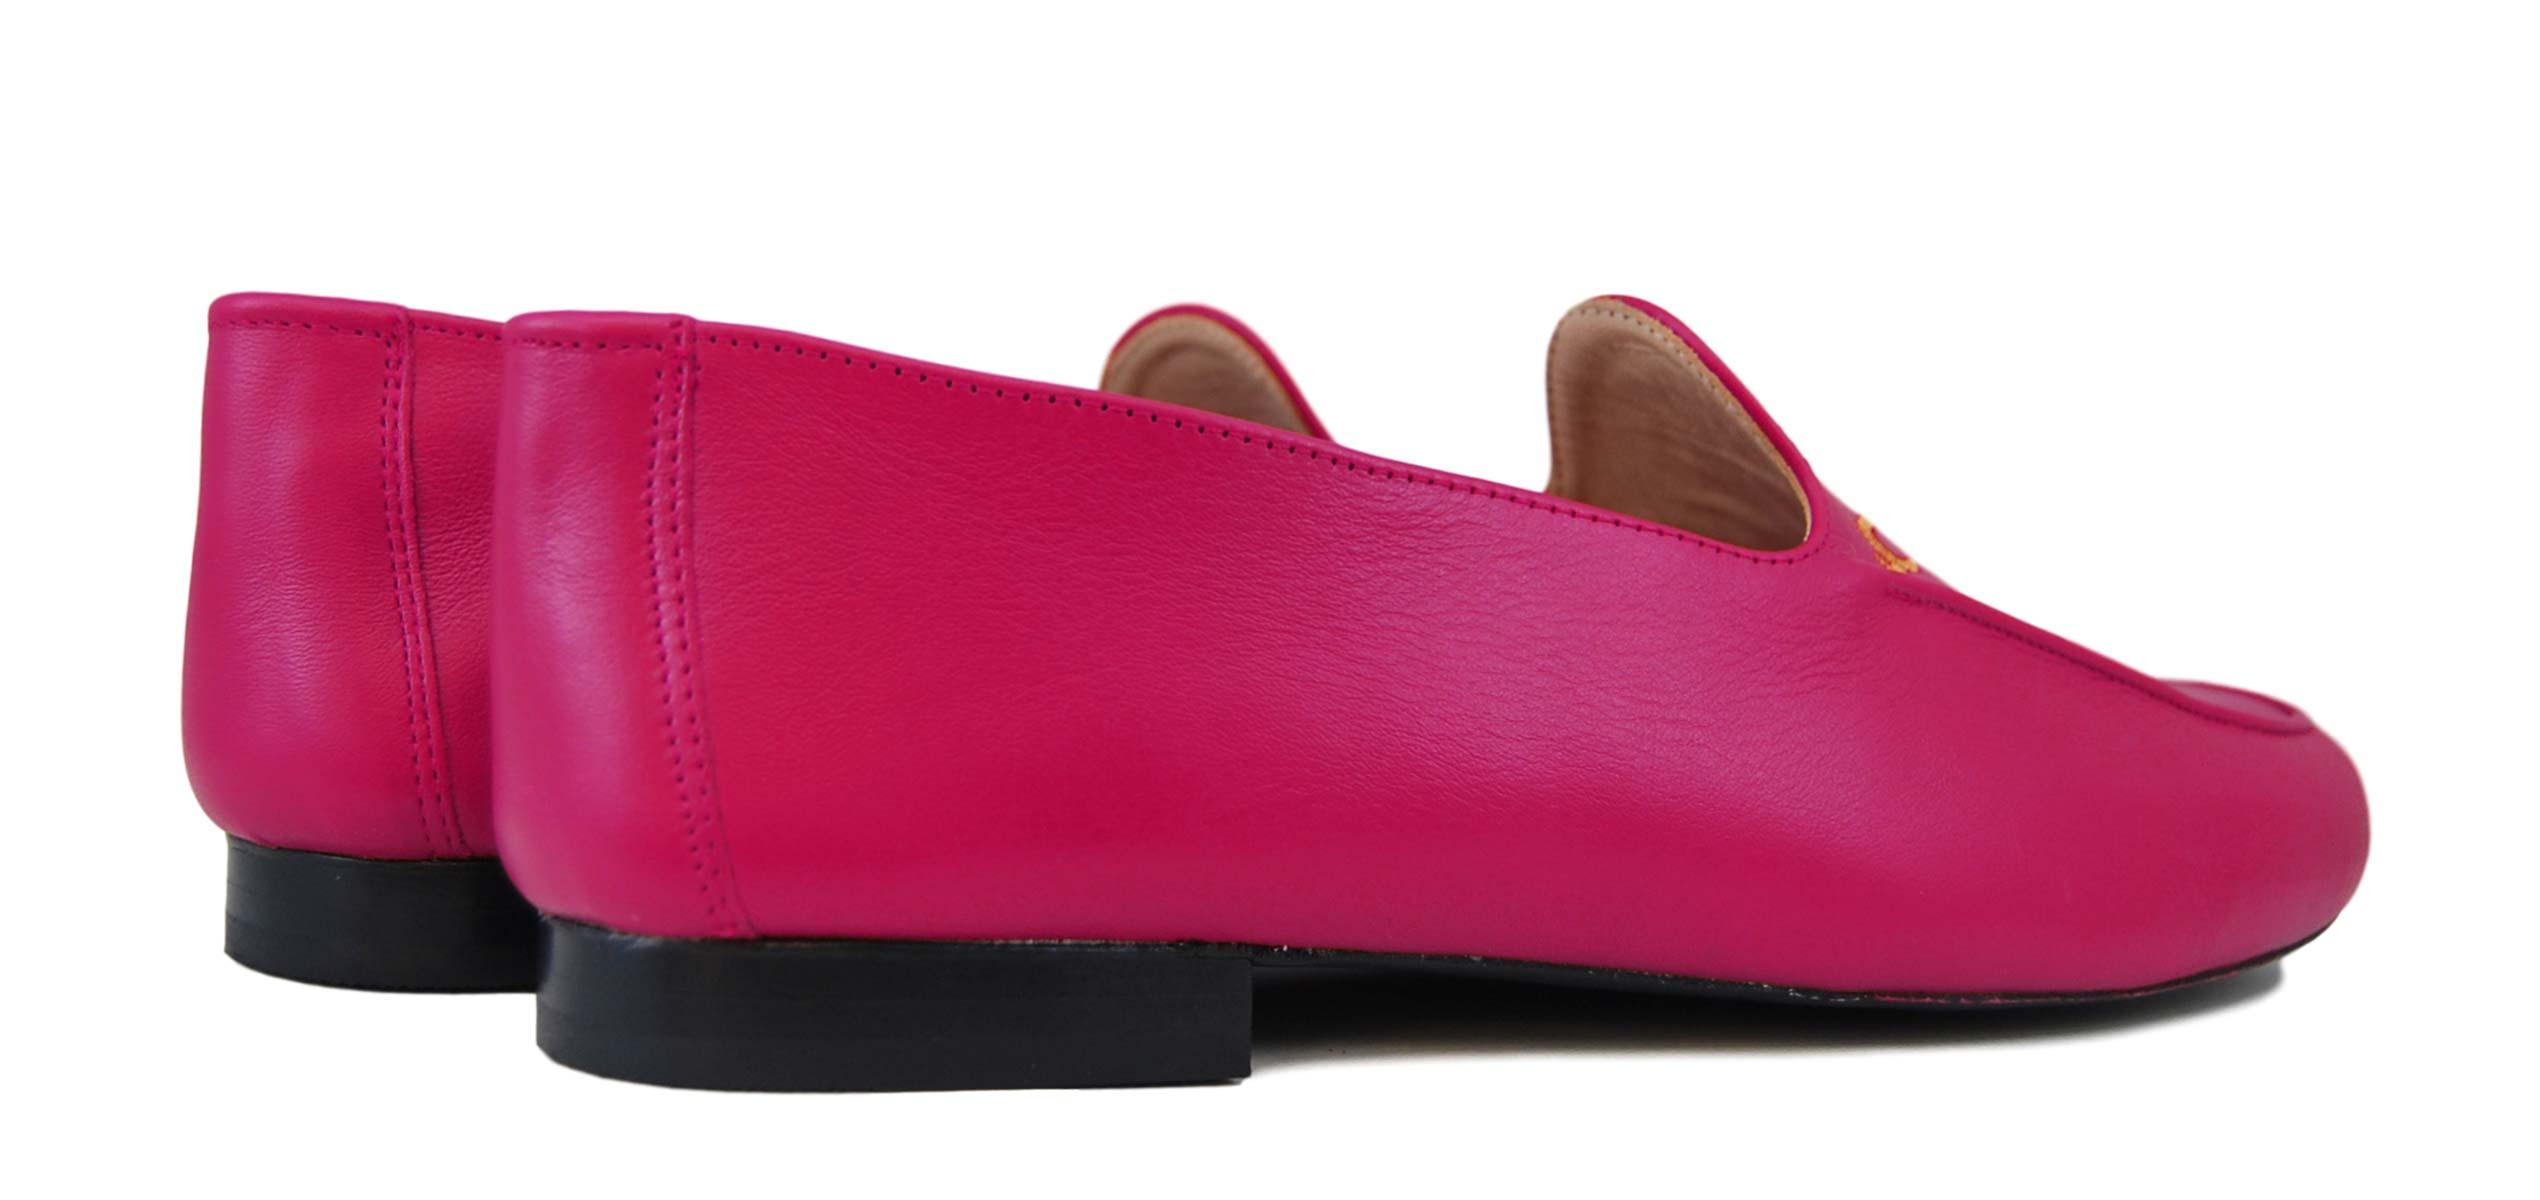 Foto 4 de Zapatos Julio Iglesias 528 JC Magenta Napa